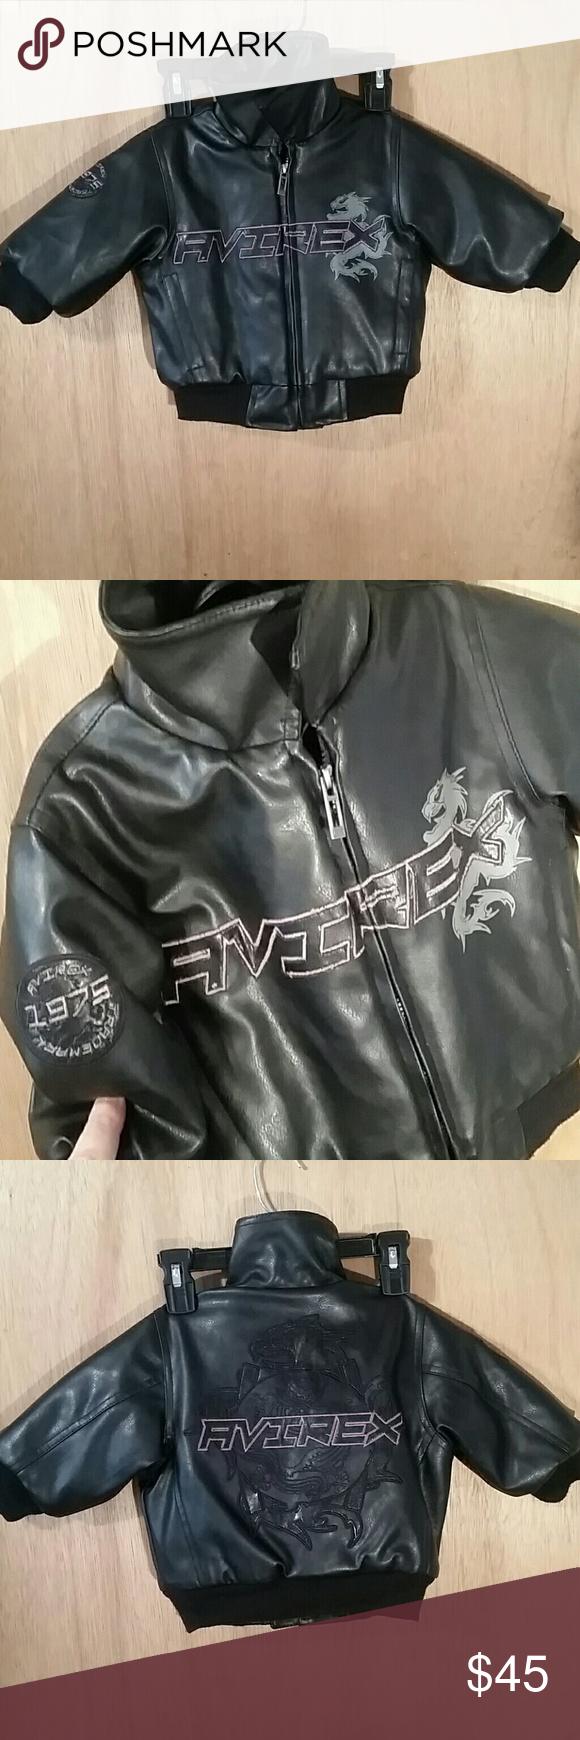 9417b706a7ff Avirex boy s toddler black polyvinyl jacket 12M